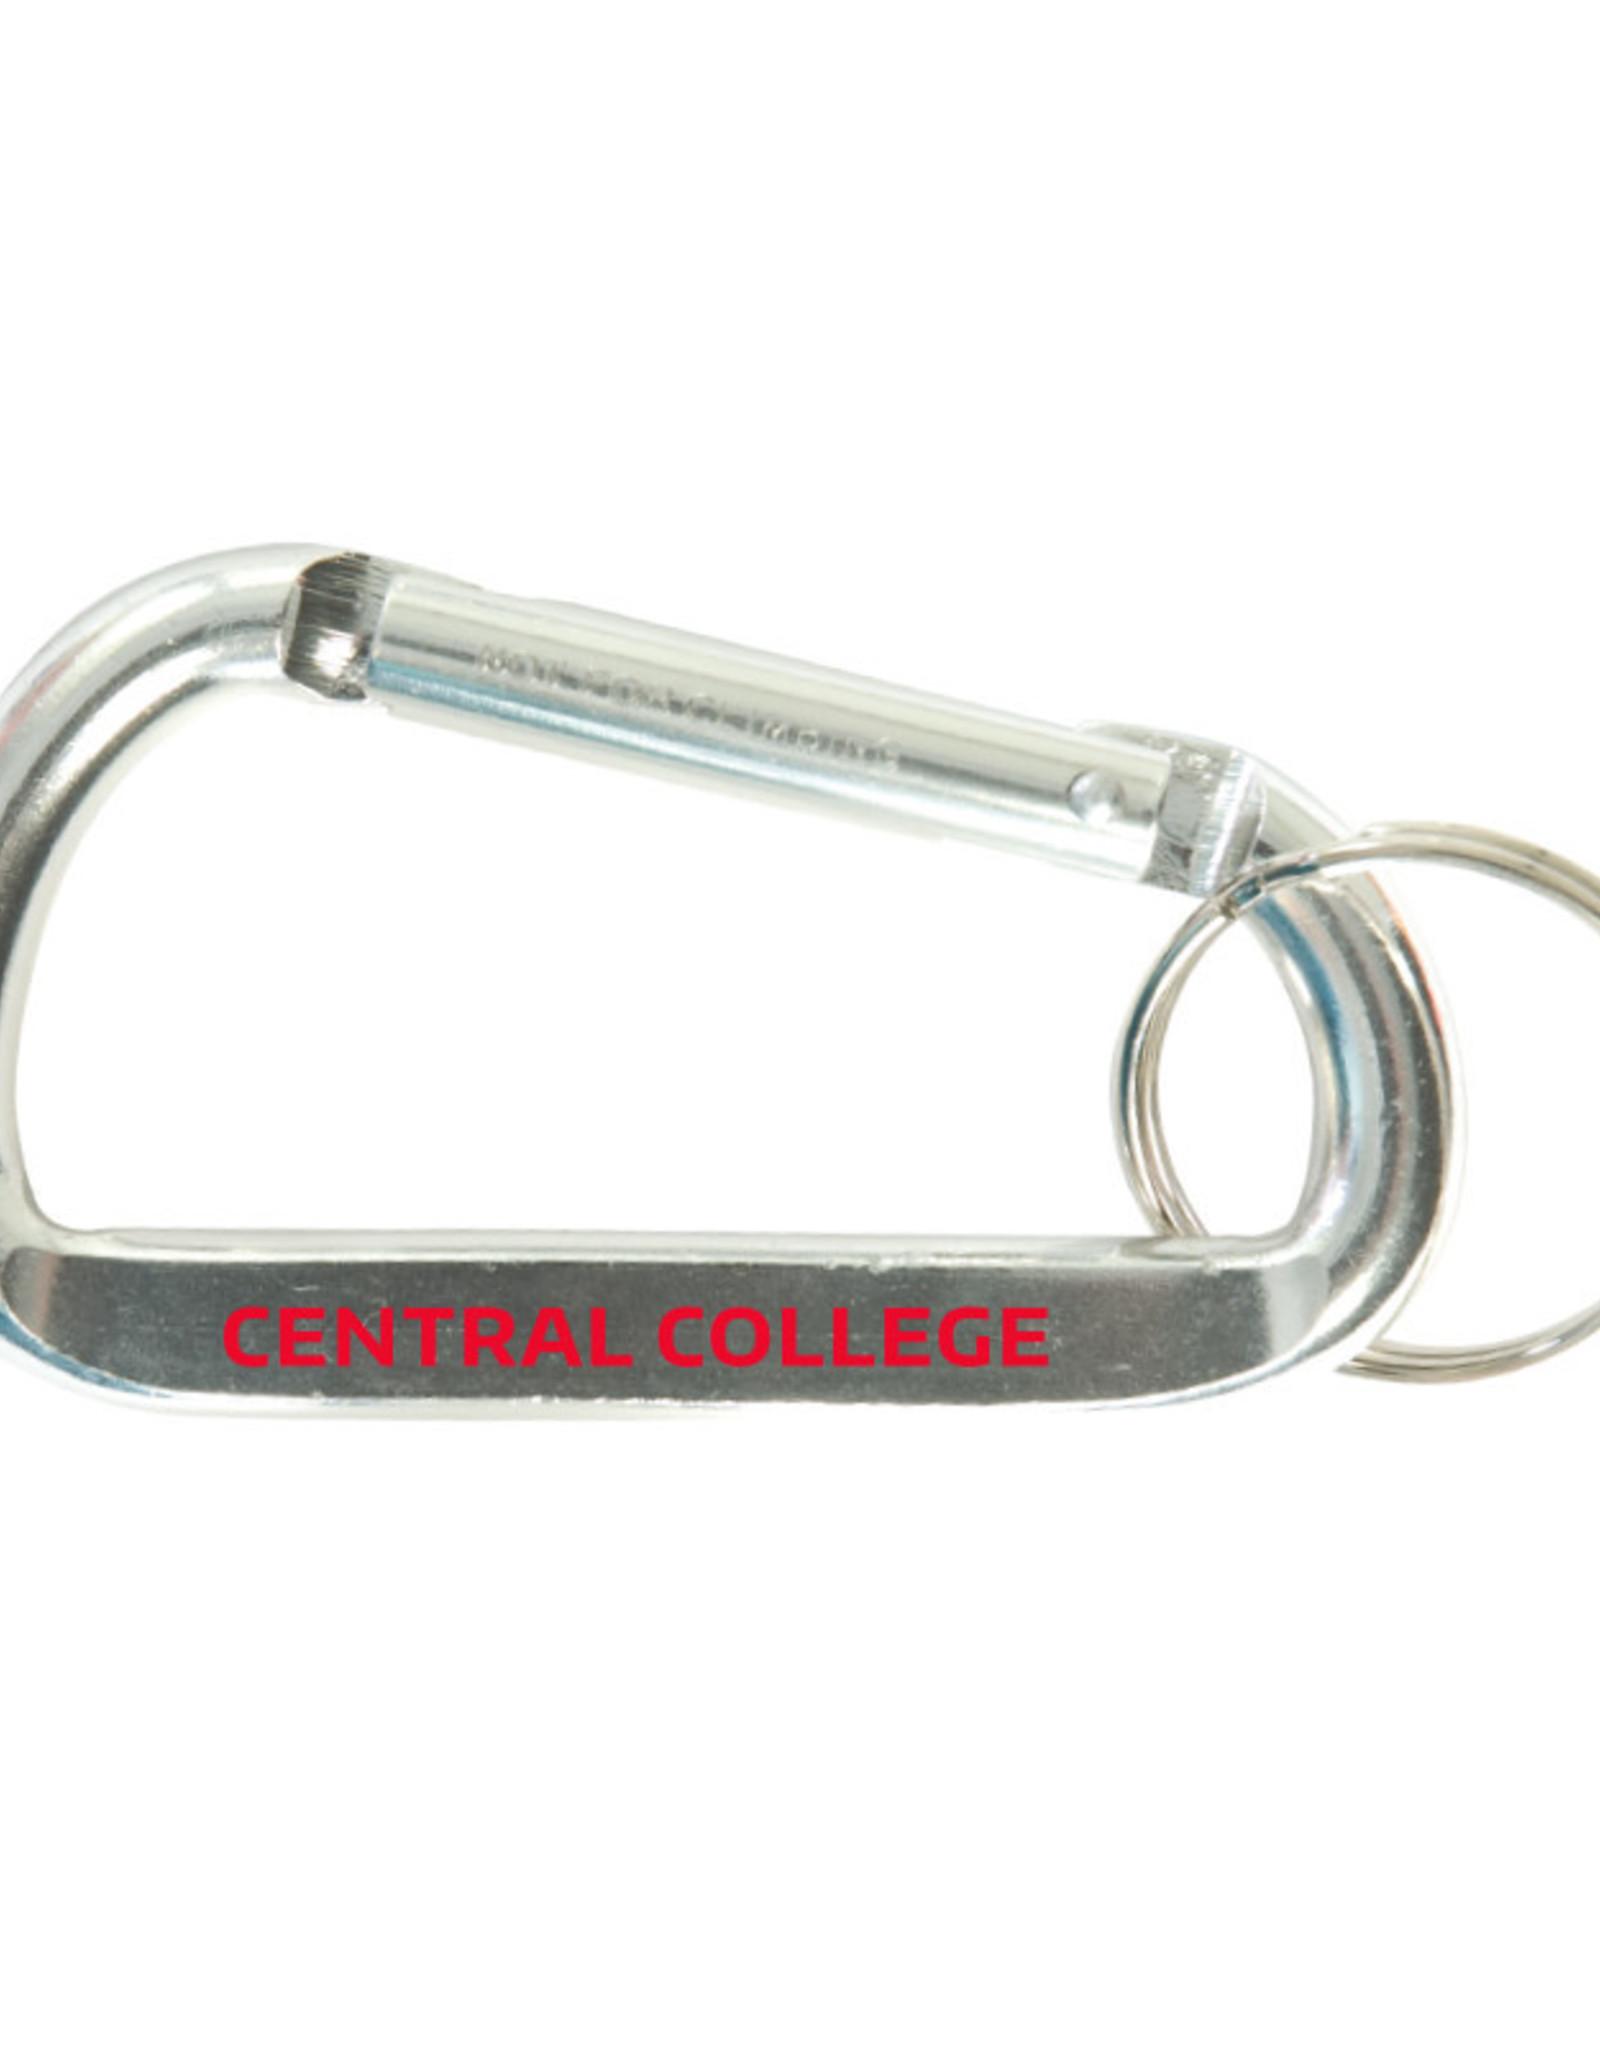 NEIL Neil Carabiner Keychain